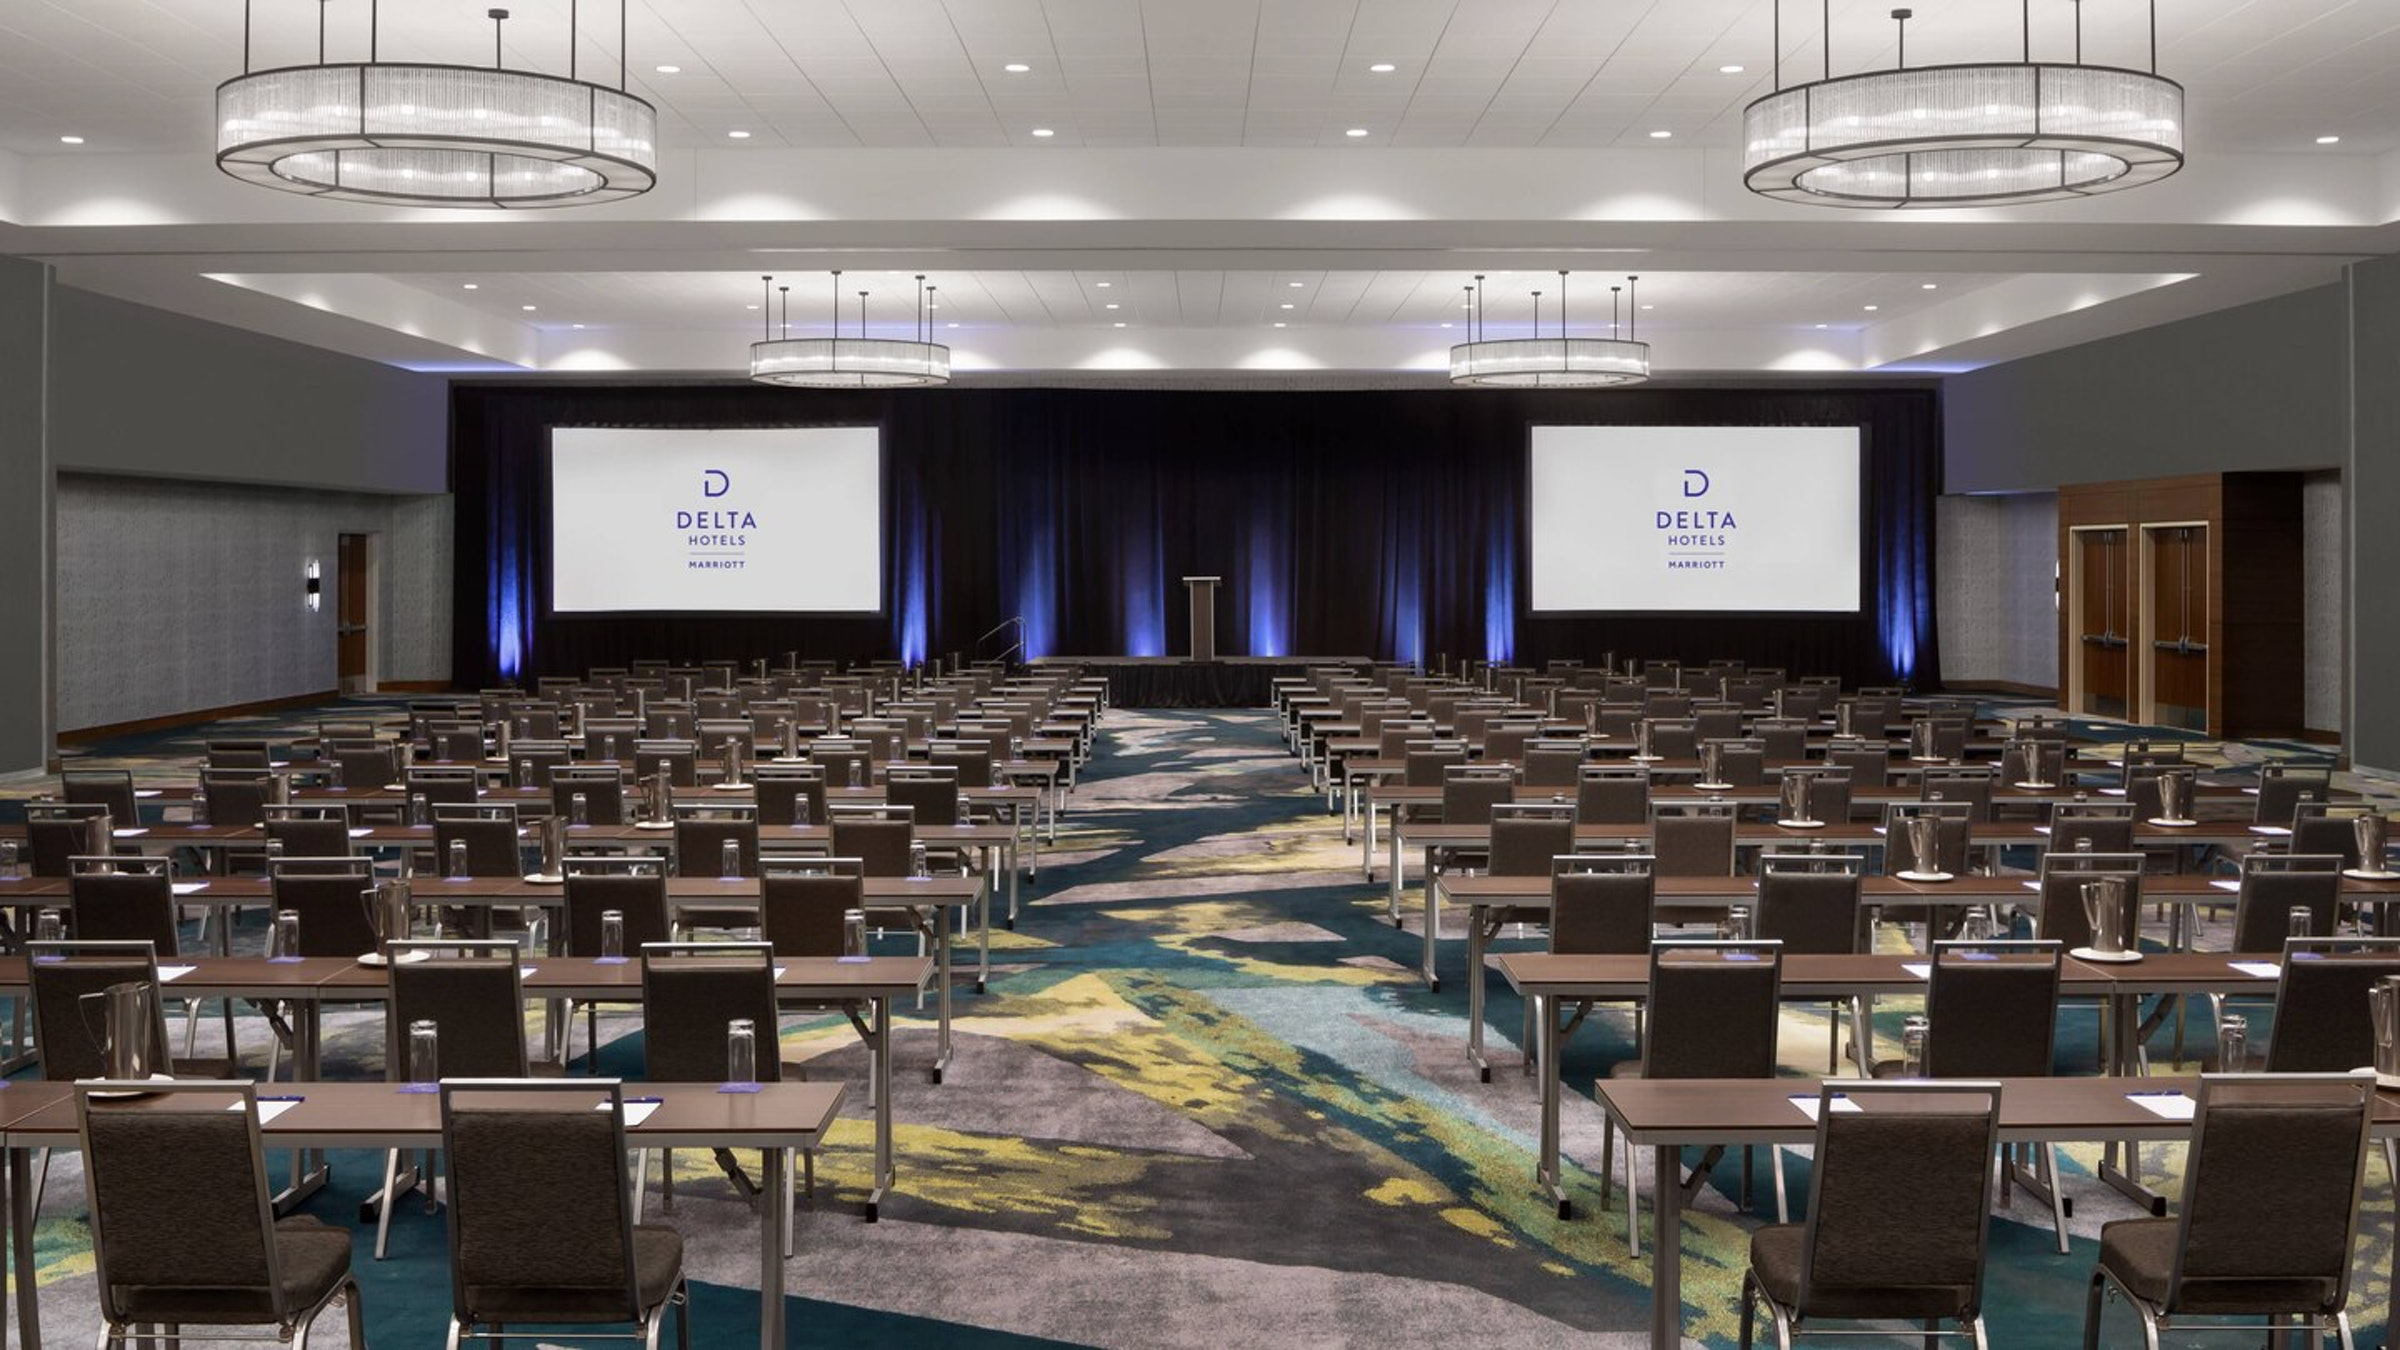 Delta Hotel - Marriott Dallas Allen & Watters Creek Convention Center in Beyond Dallas